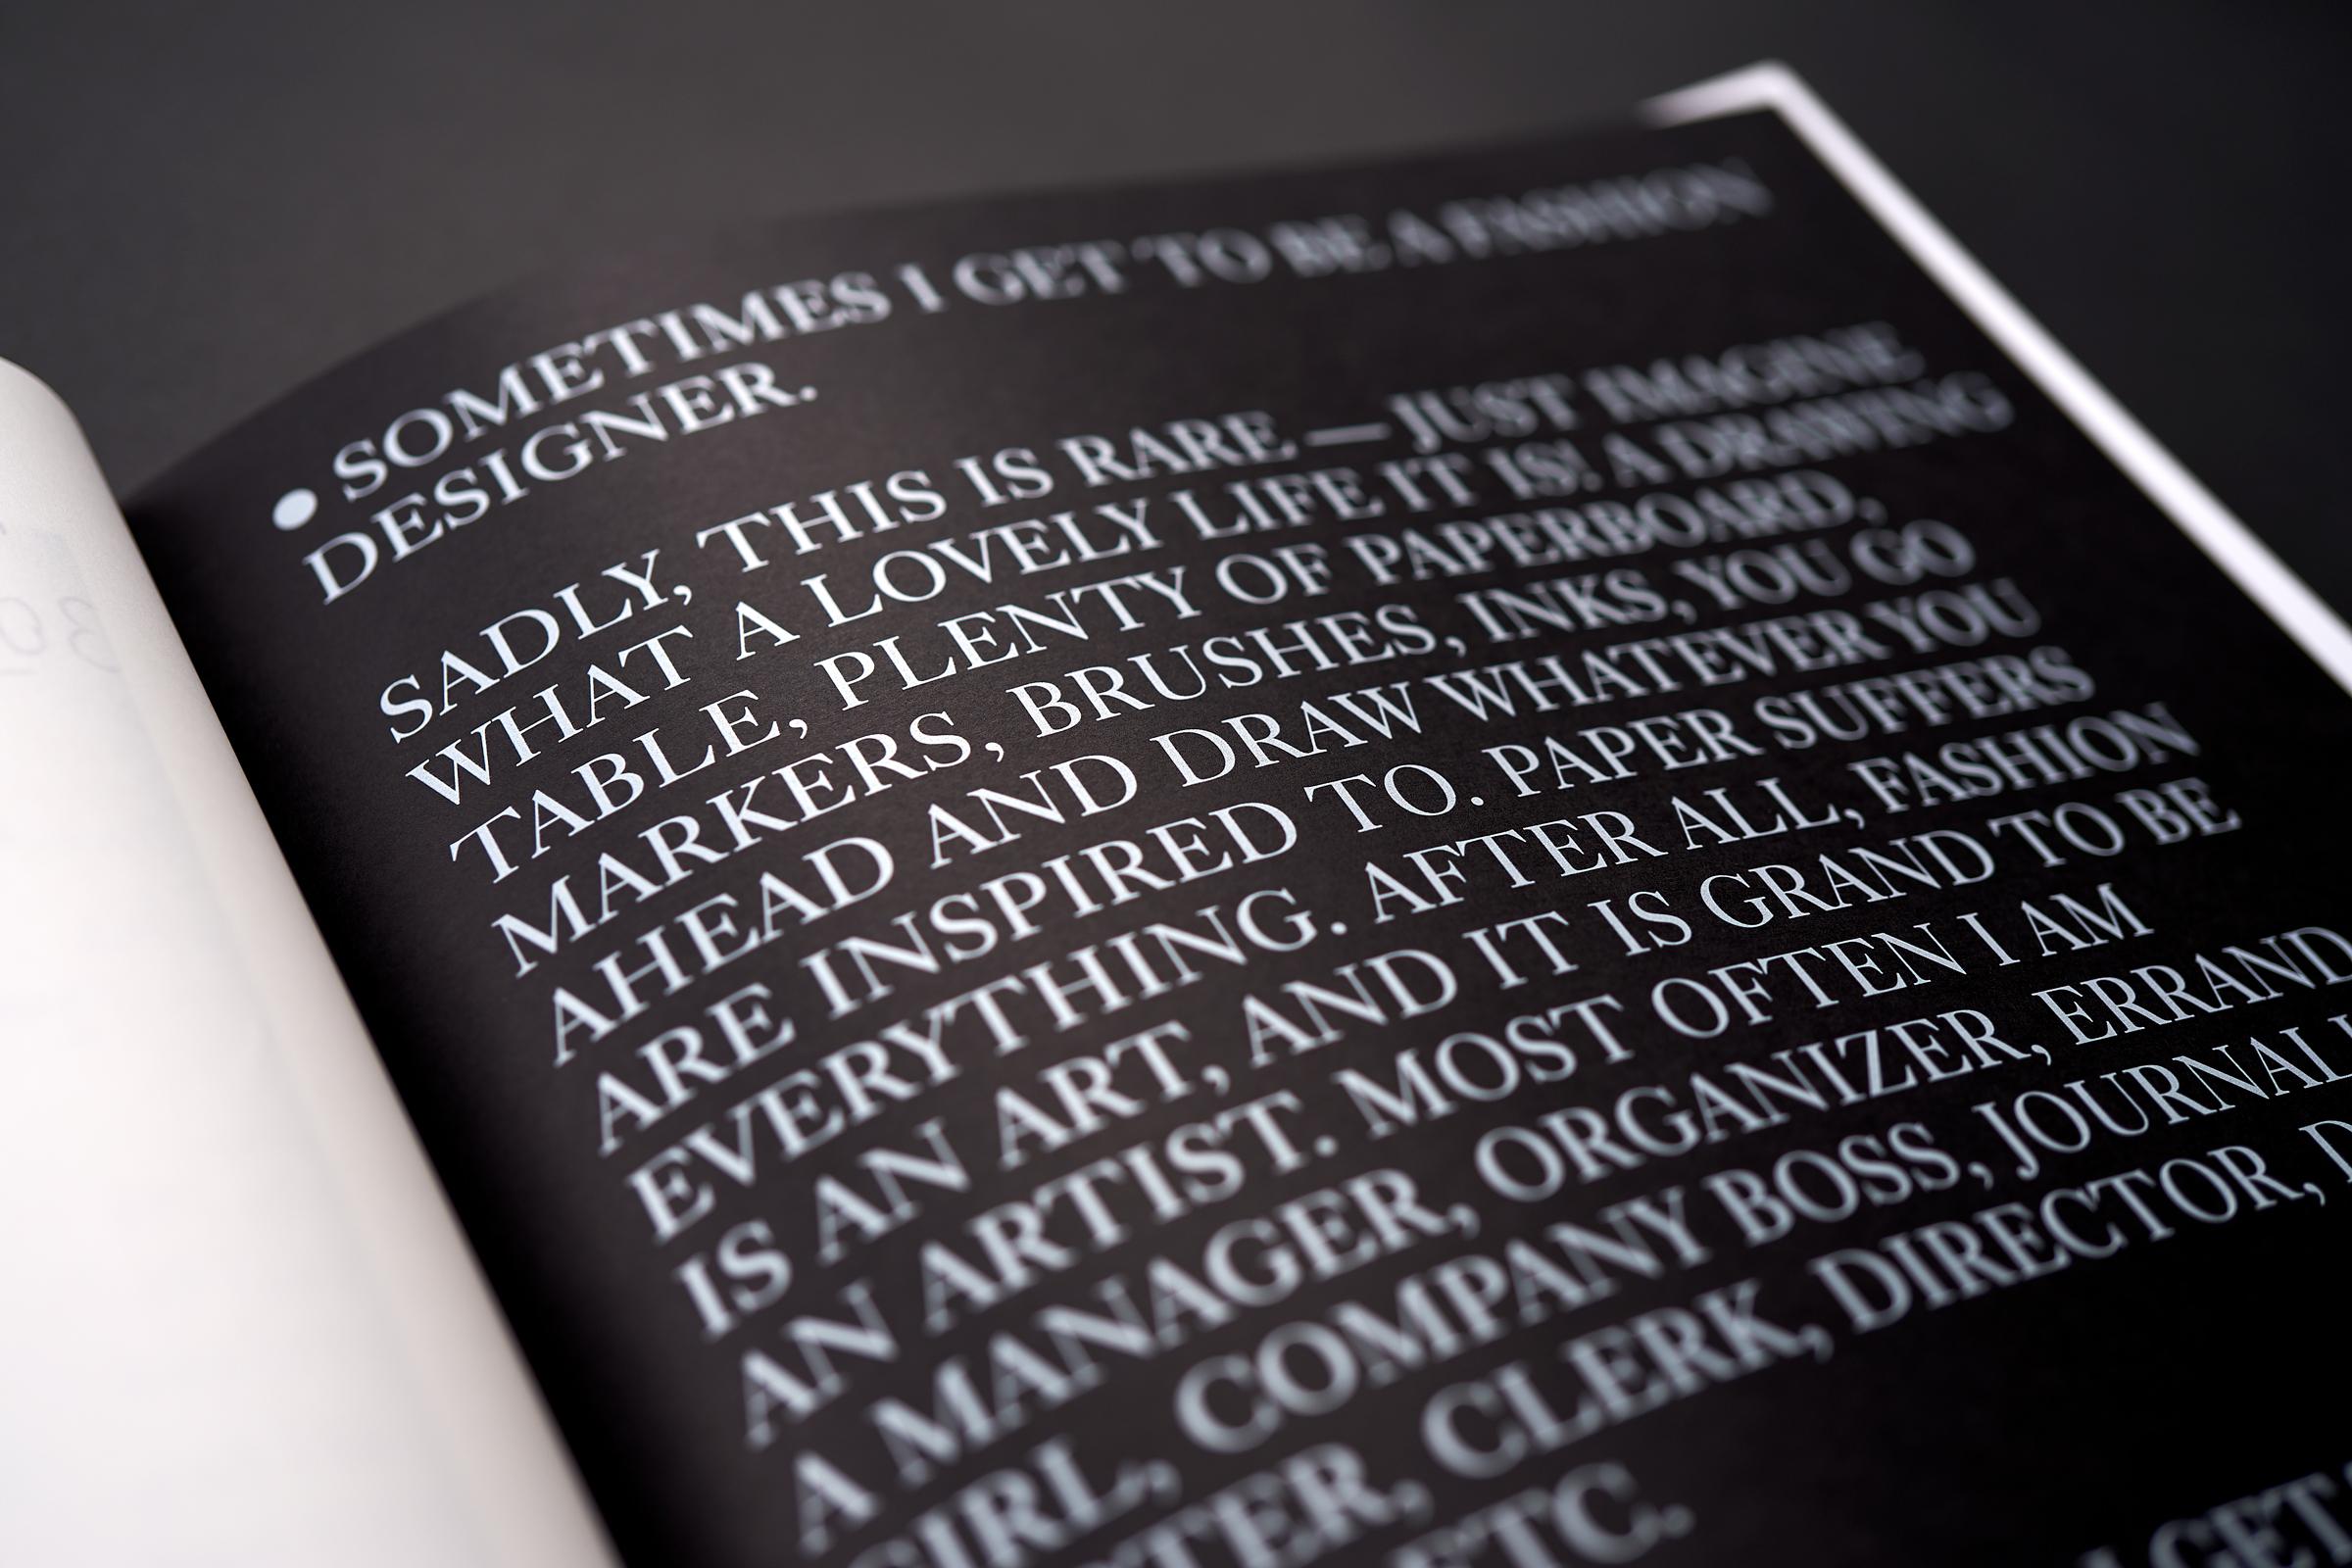 Katalog z wystawy Barbary Hoff